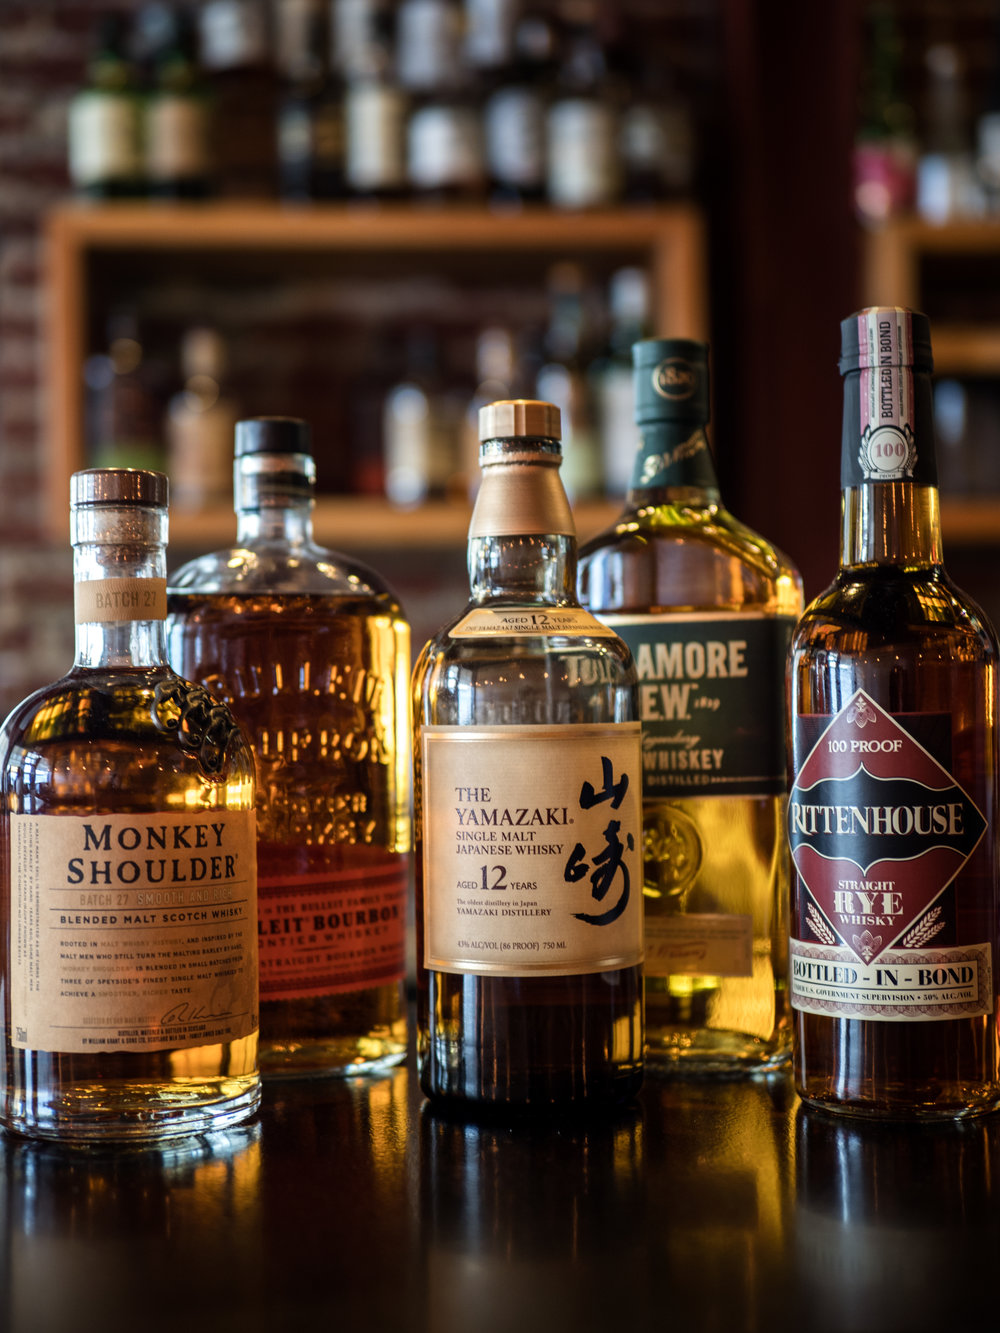 Musings by the Glass - Autumn Whiskey Primer - Whiskey Bottles on Bar